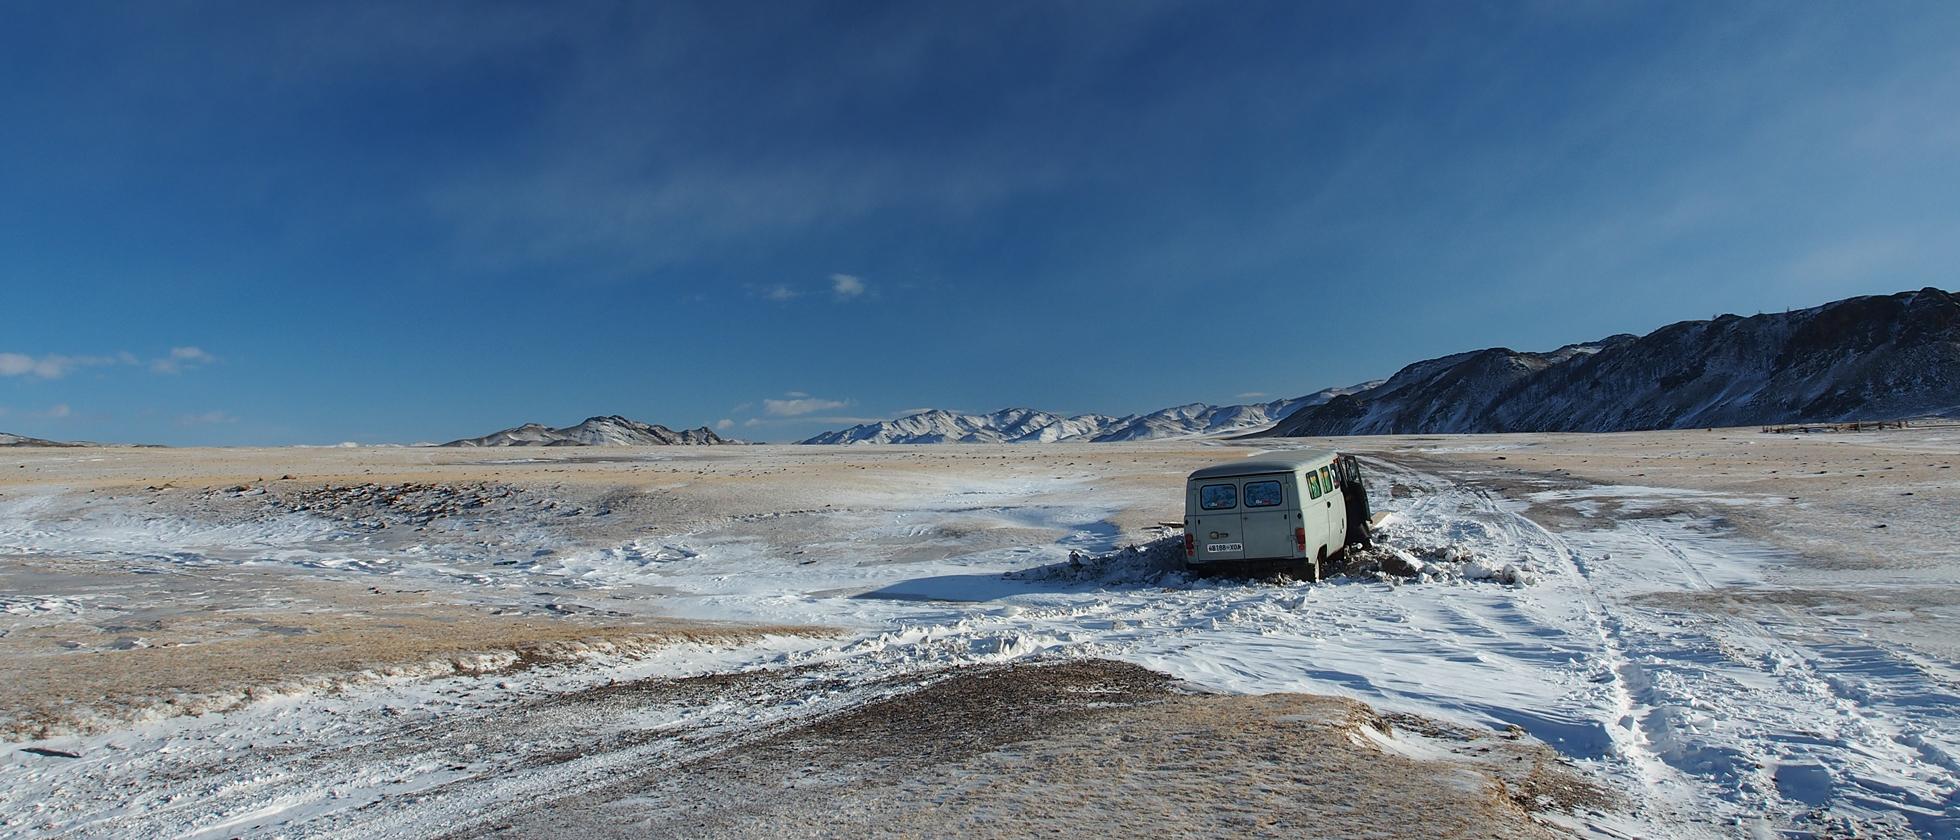 Mongolië, één groot avontuur!